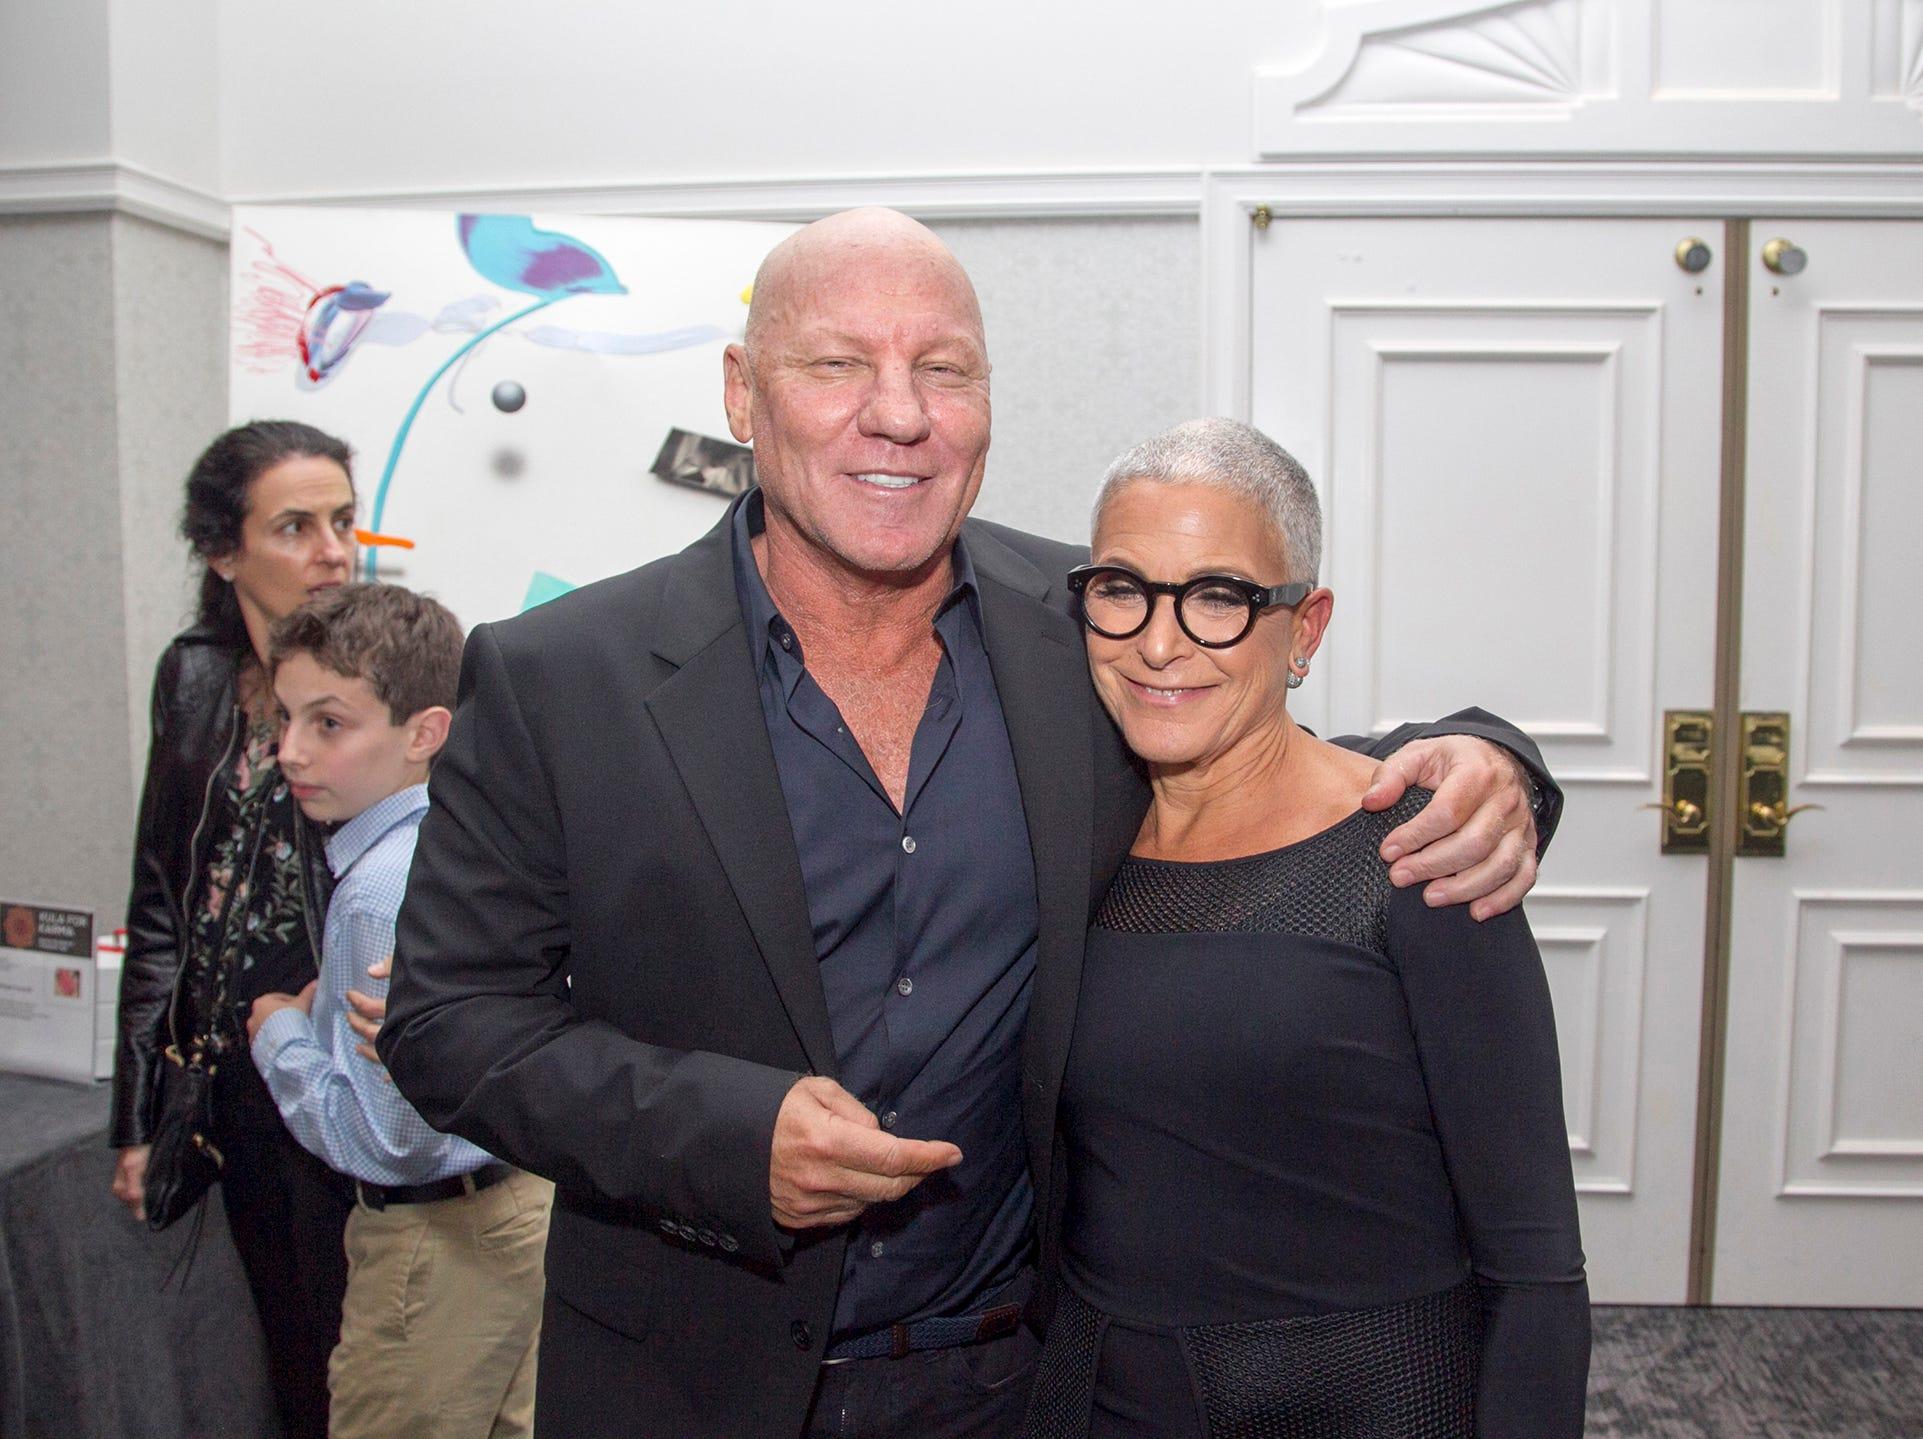 Steve Madden, Penni Feiner.  Kula for Karma's 11th Anniversary gala at Pearl River Hilton. 11/05/2018